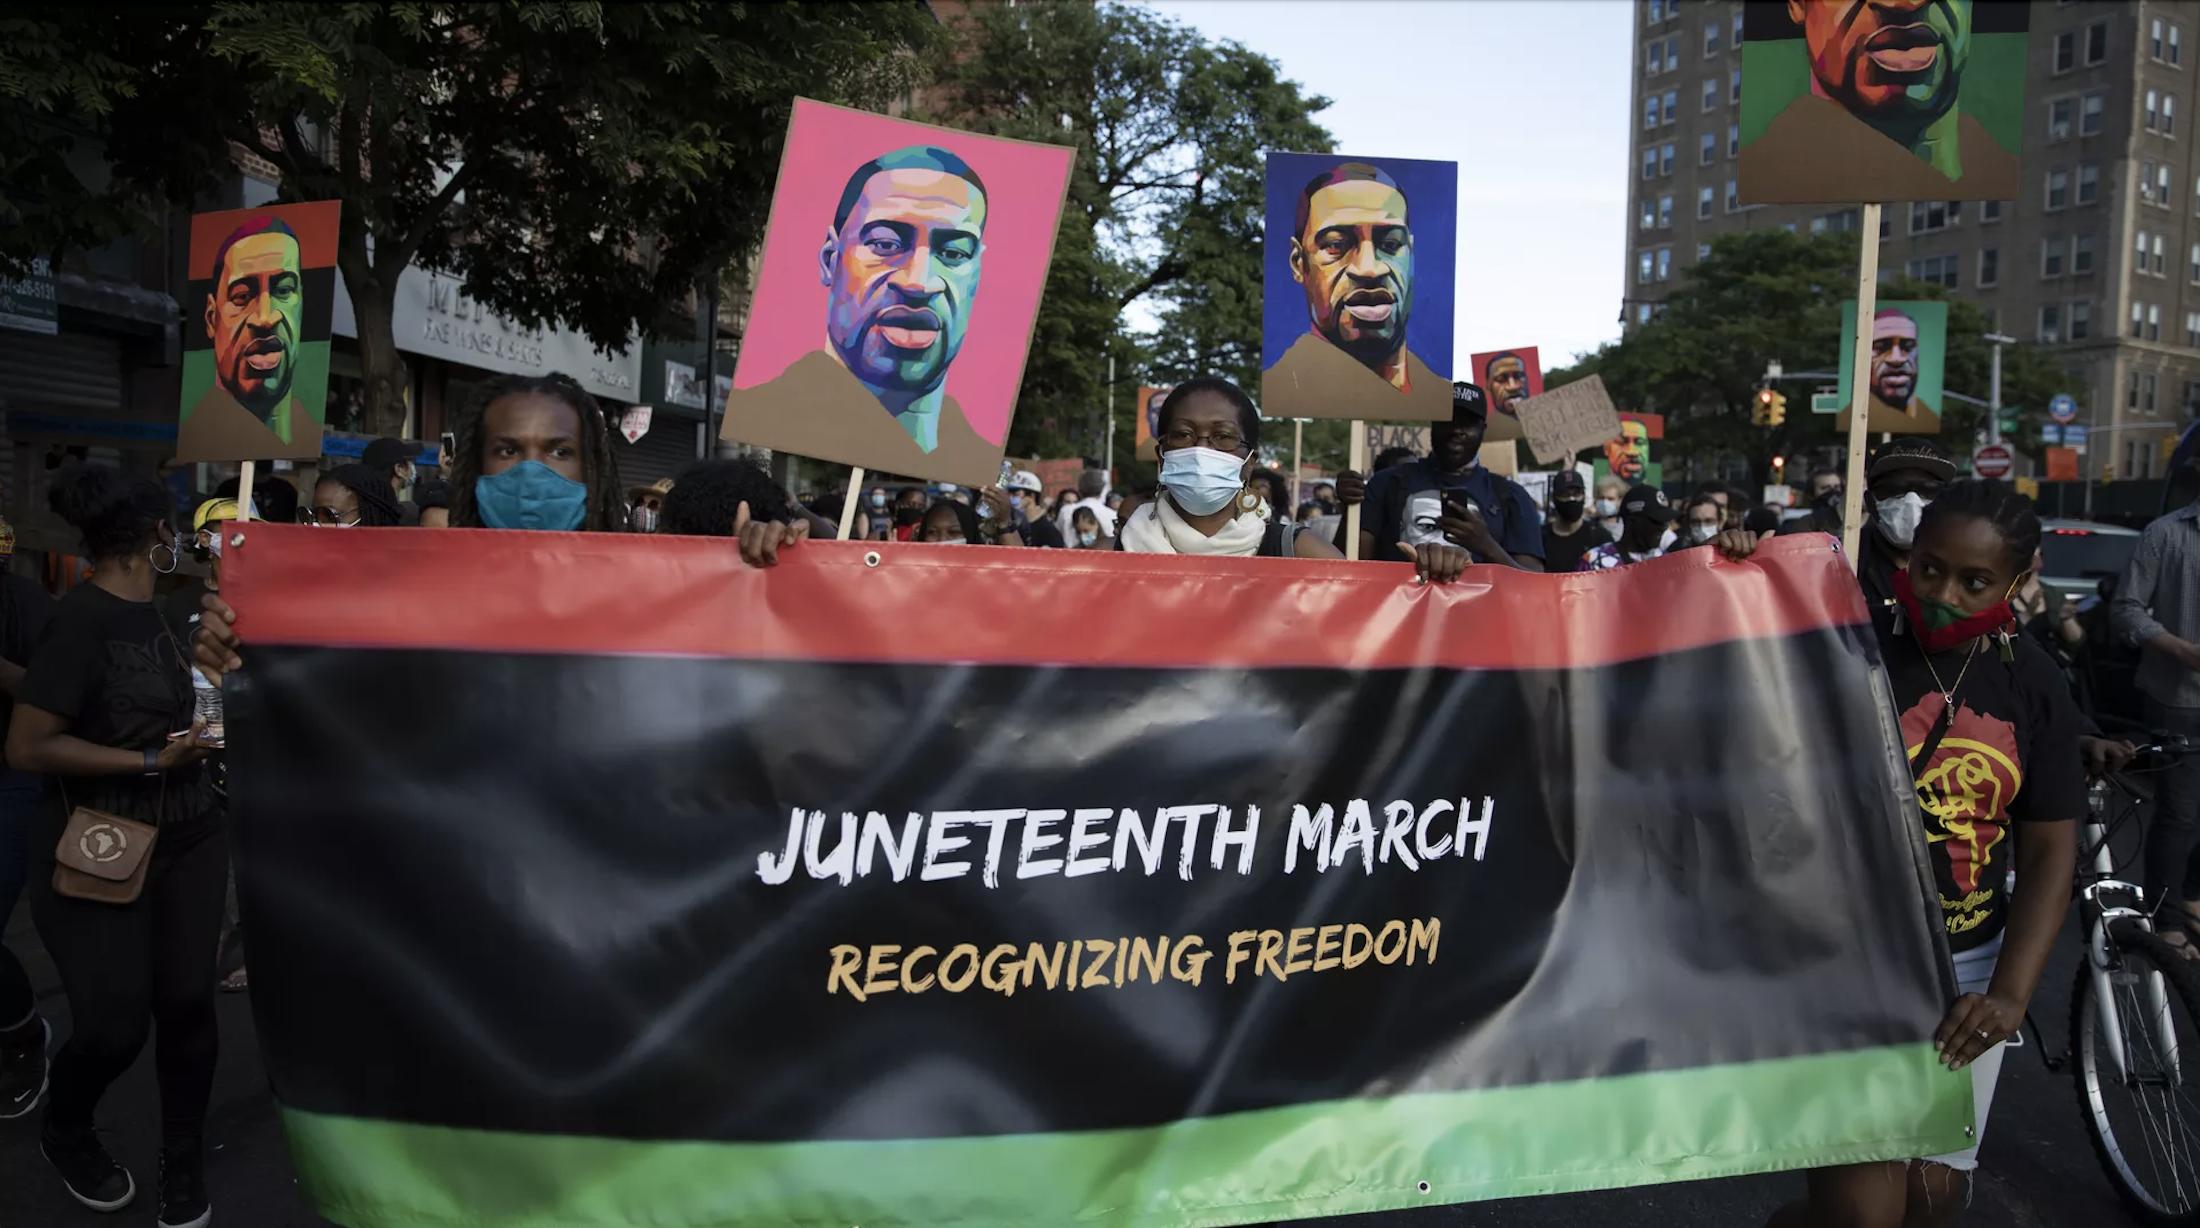 Juneteenth march